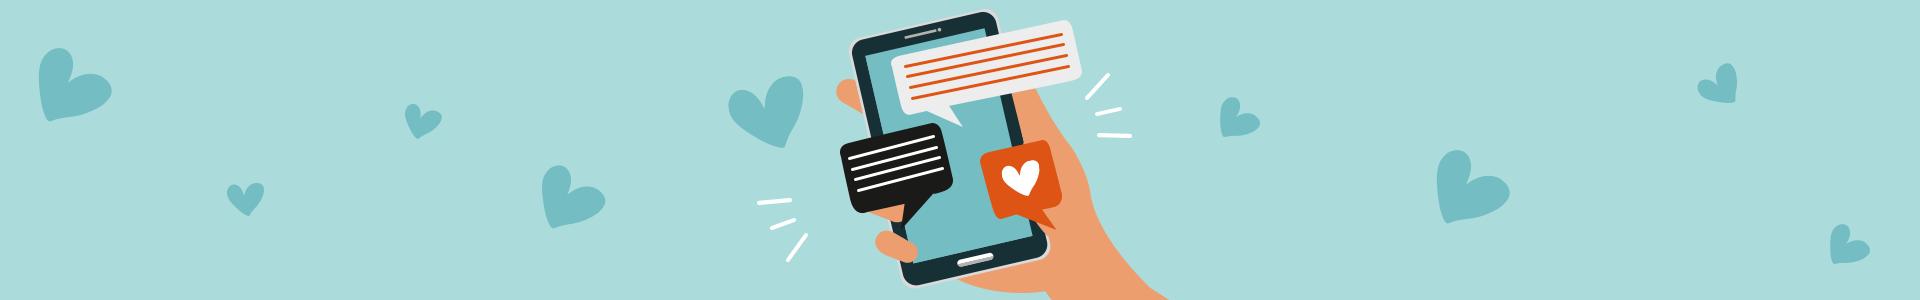 KPIs im Social Media Marketing: Erfolge effektiv messen